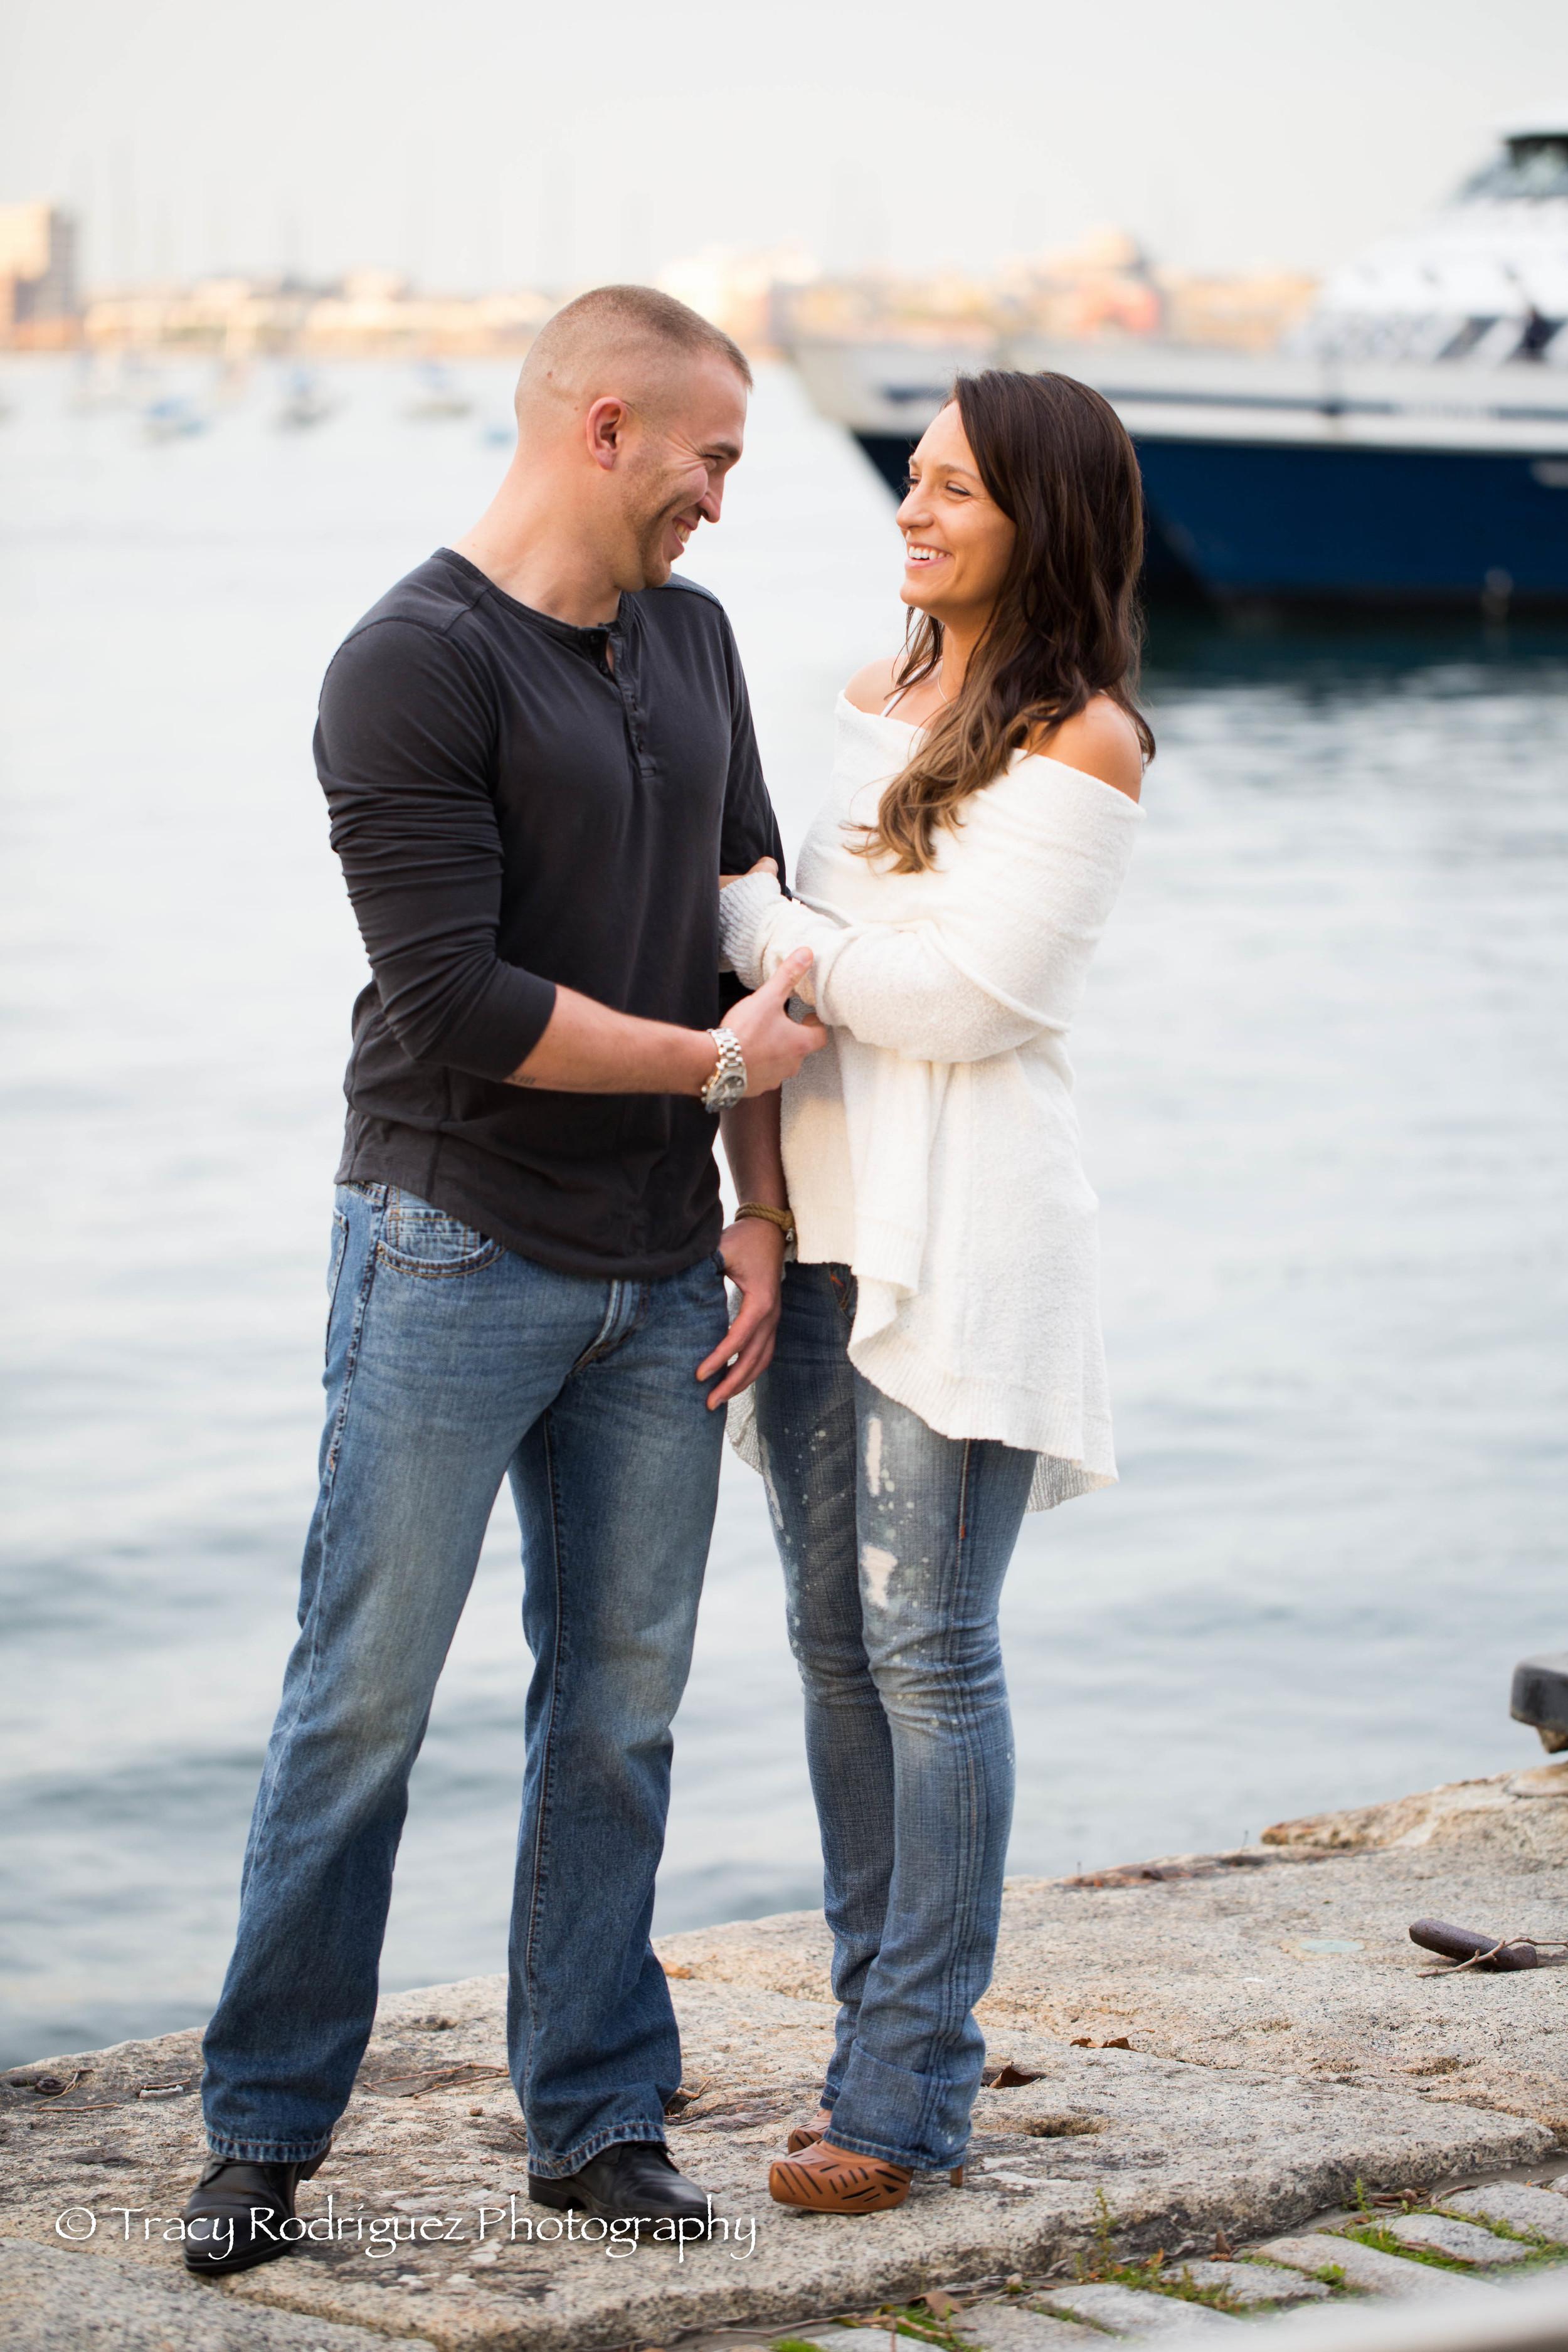 THR-SashaBrian-Engagement-20.jpg